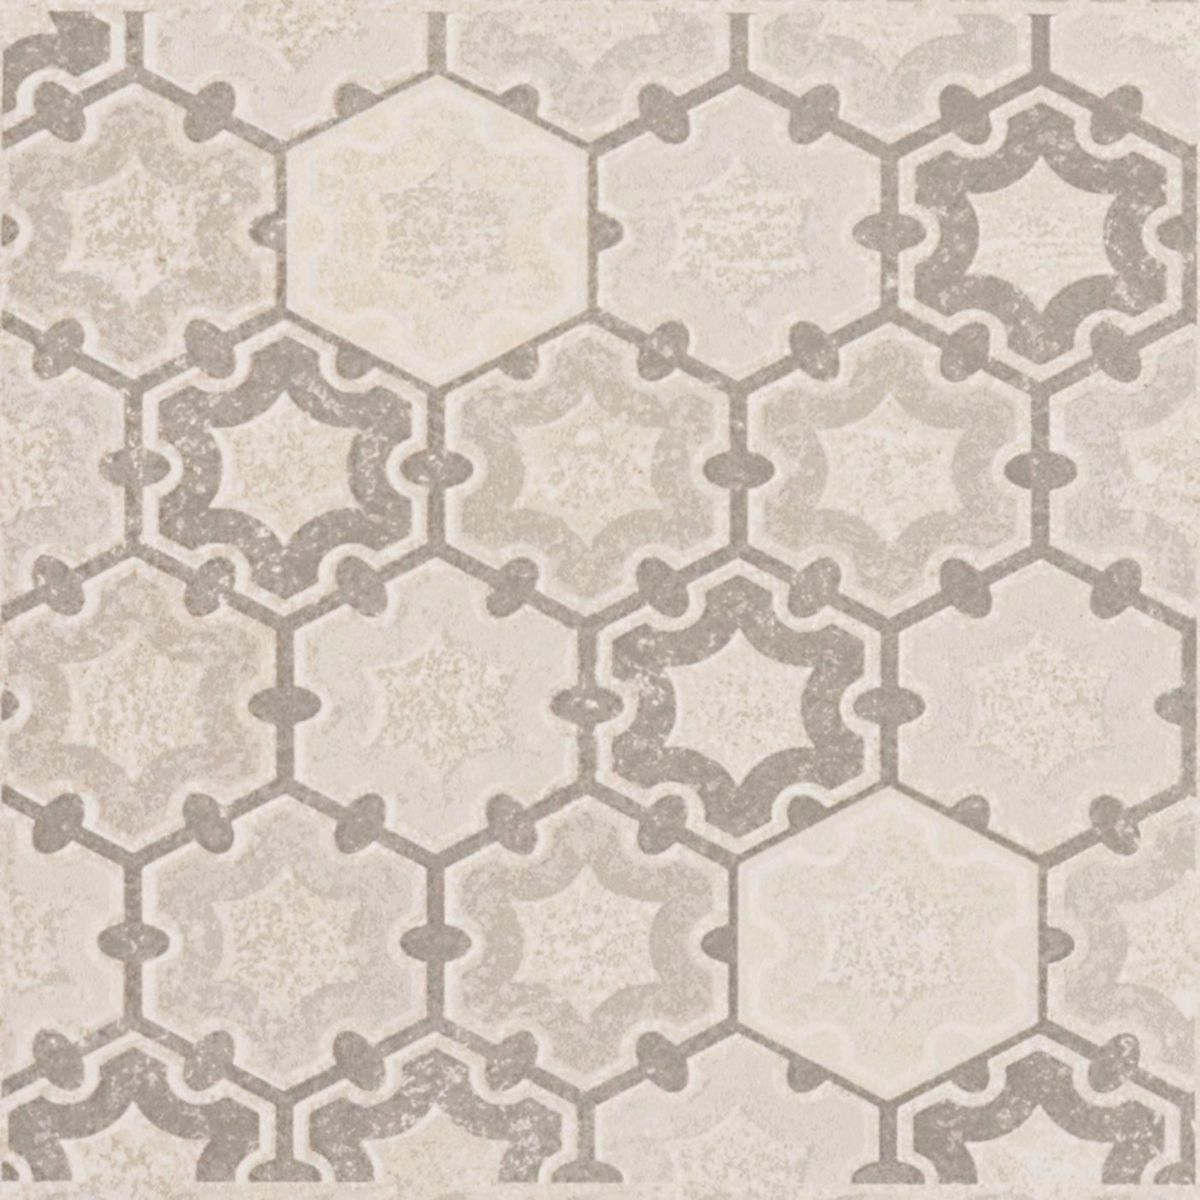 Carrelage Mural Interieur Gres Cerame Kotto Xl Deko Texture Decor Calce Rectifie 20x20 Cm Emilceramica